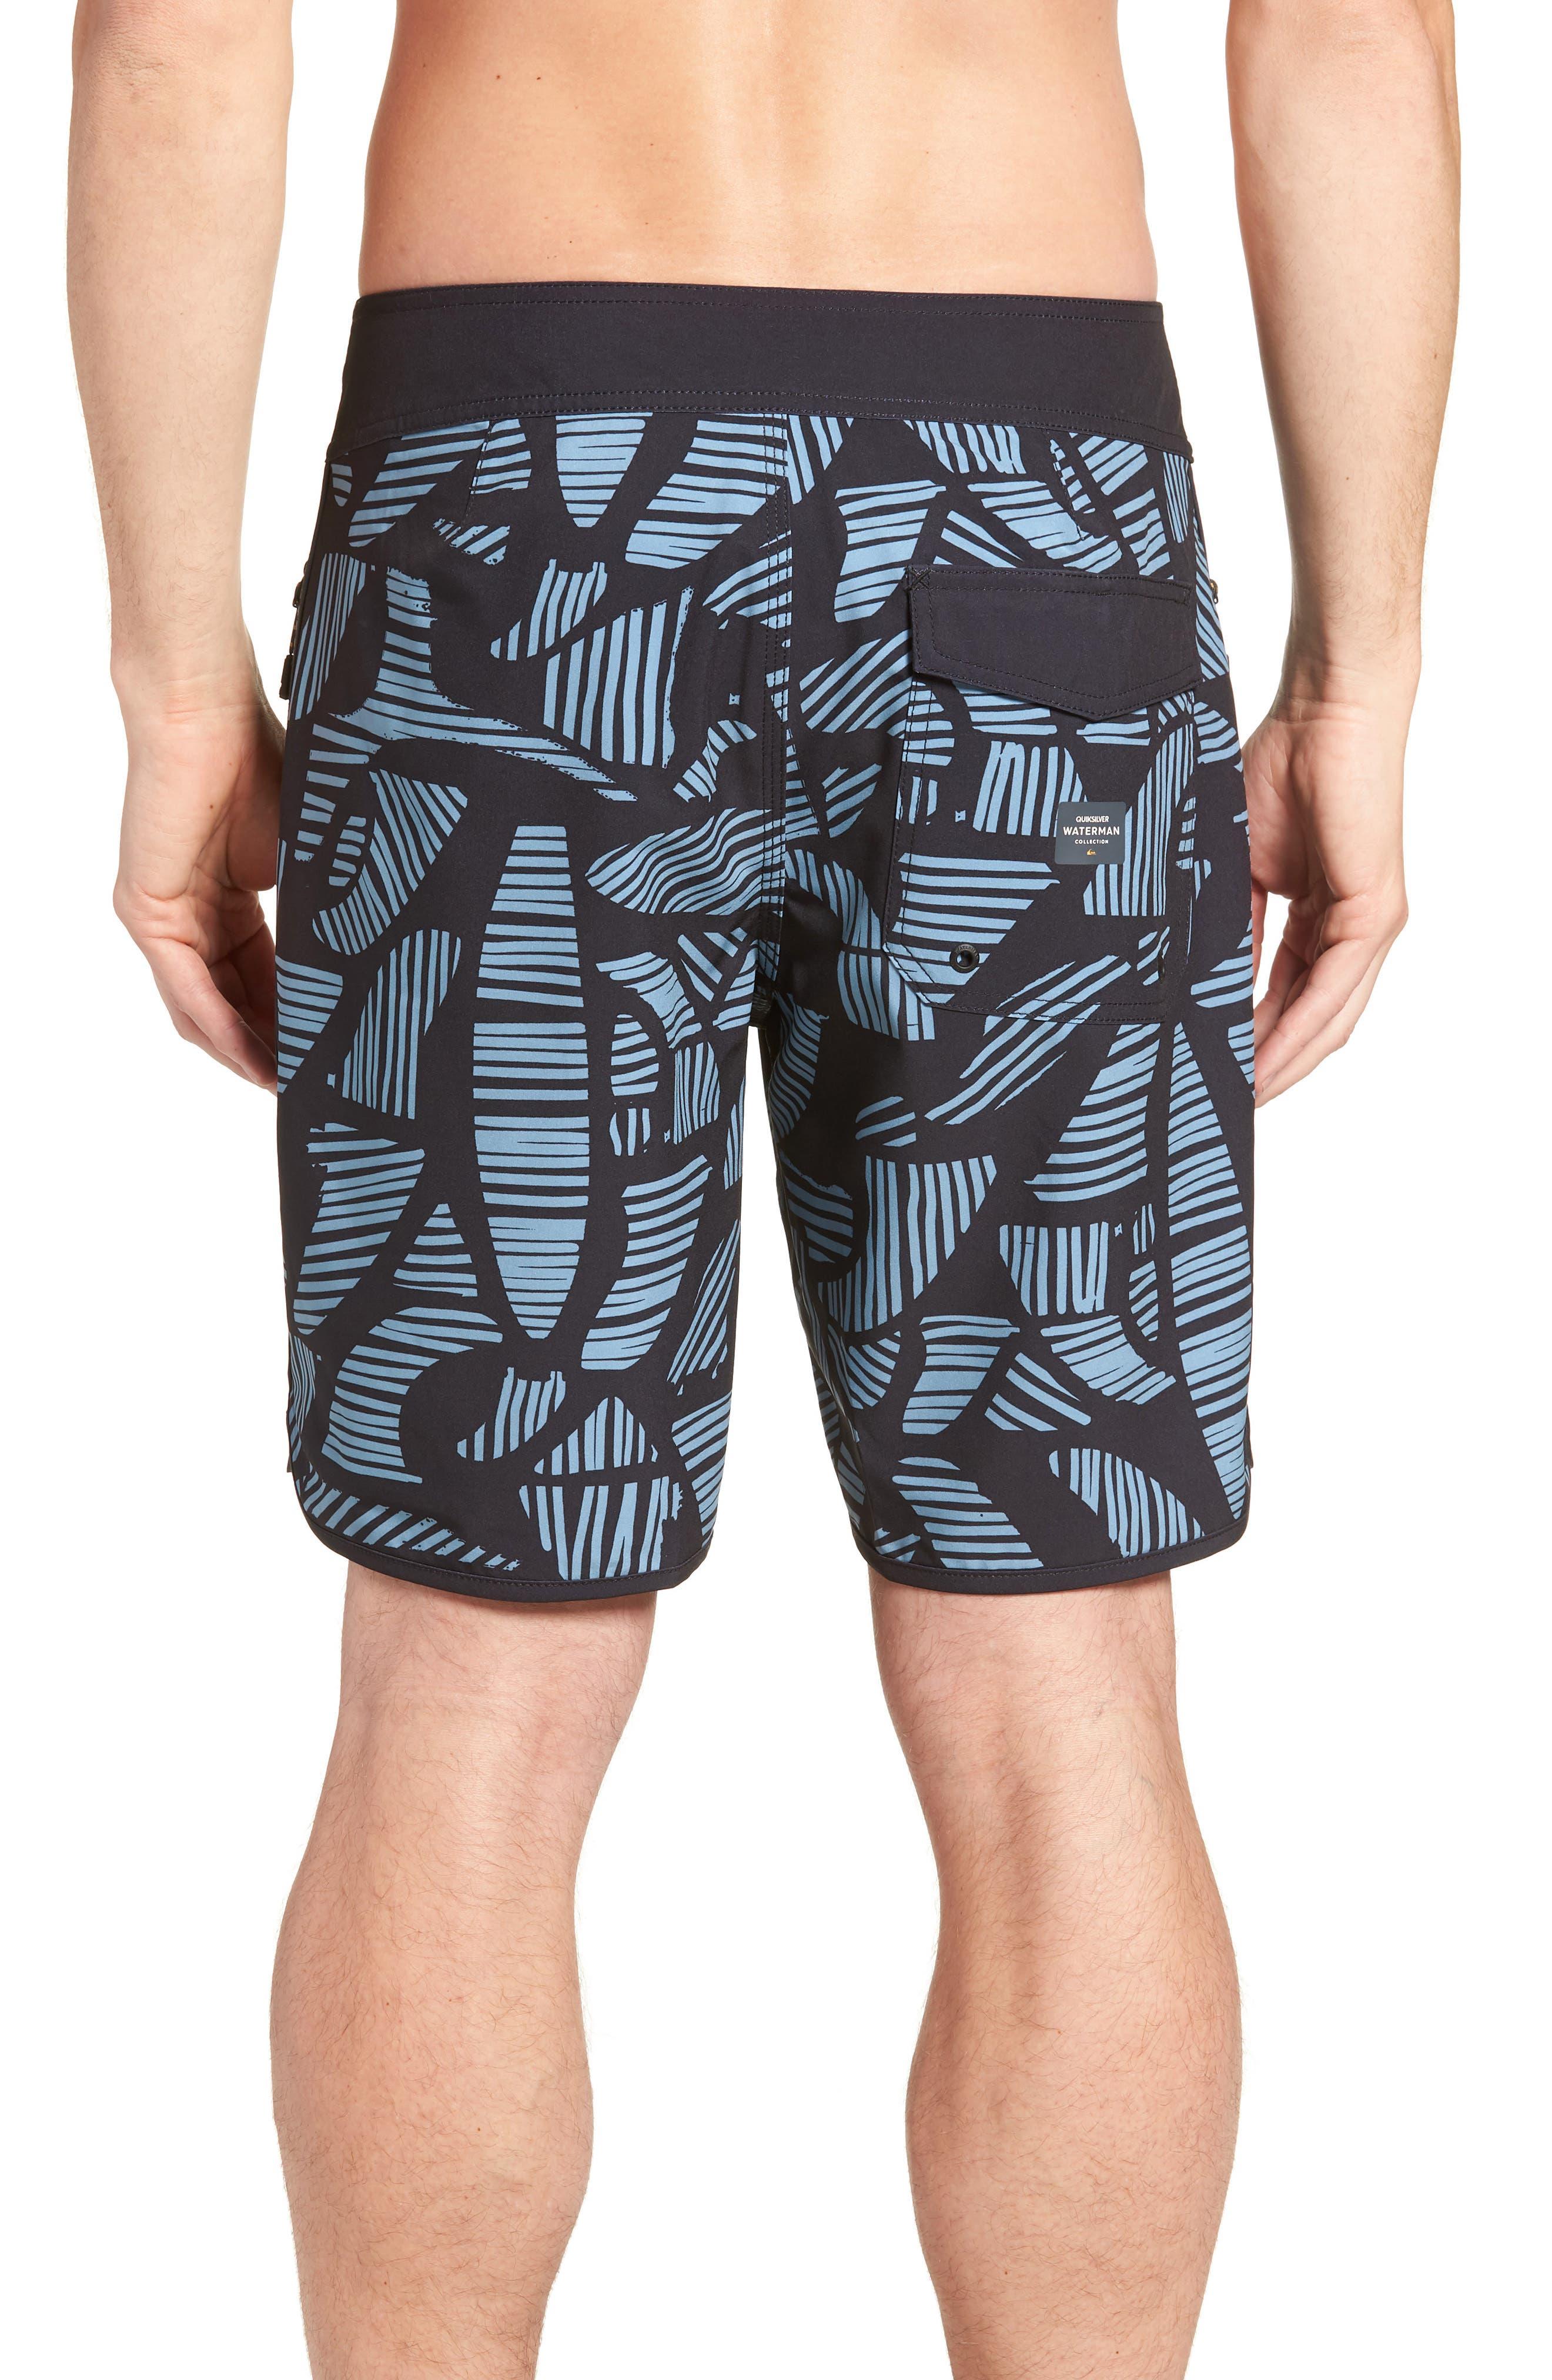 Odysea Board Shorts,                             Alternate thumbnail 2, color,                             002